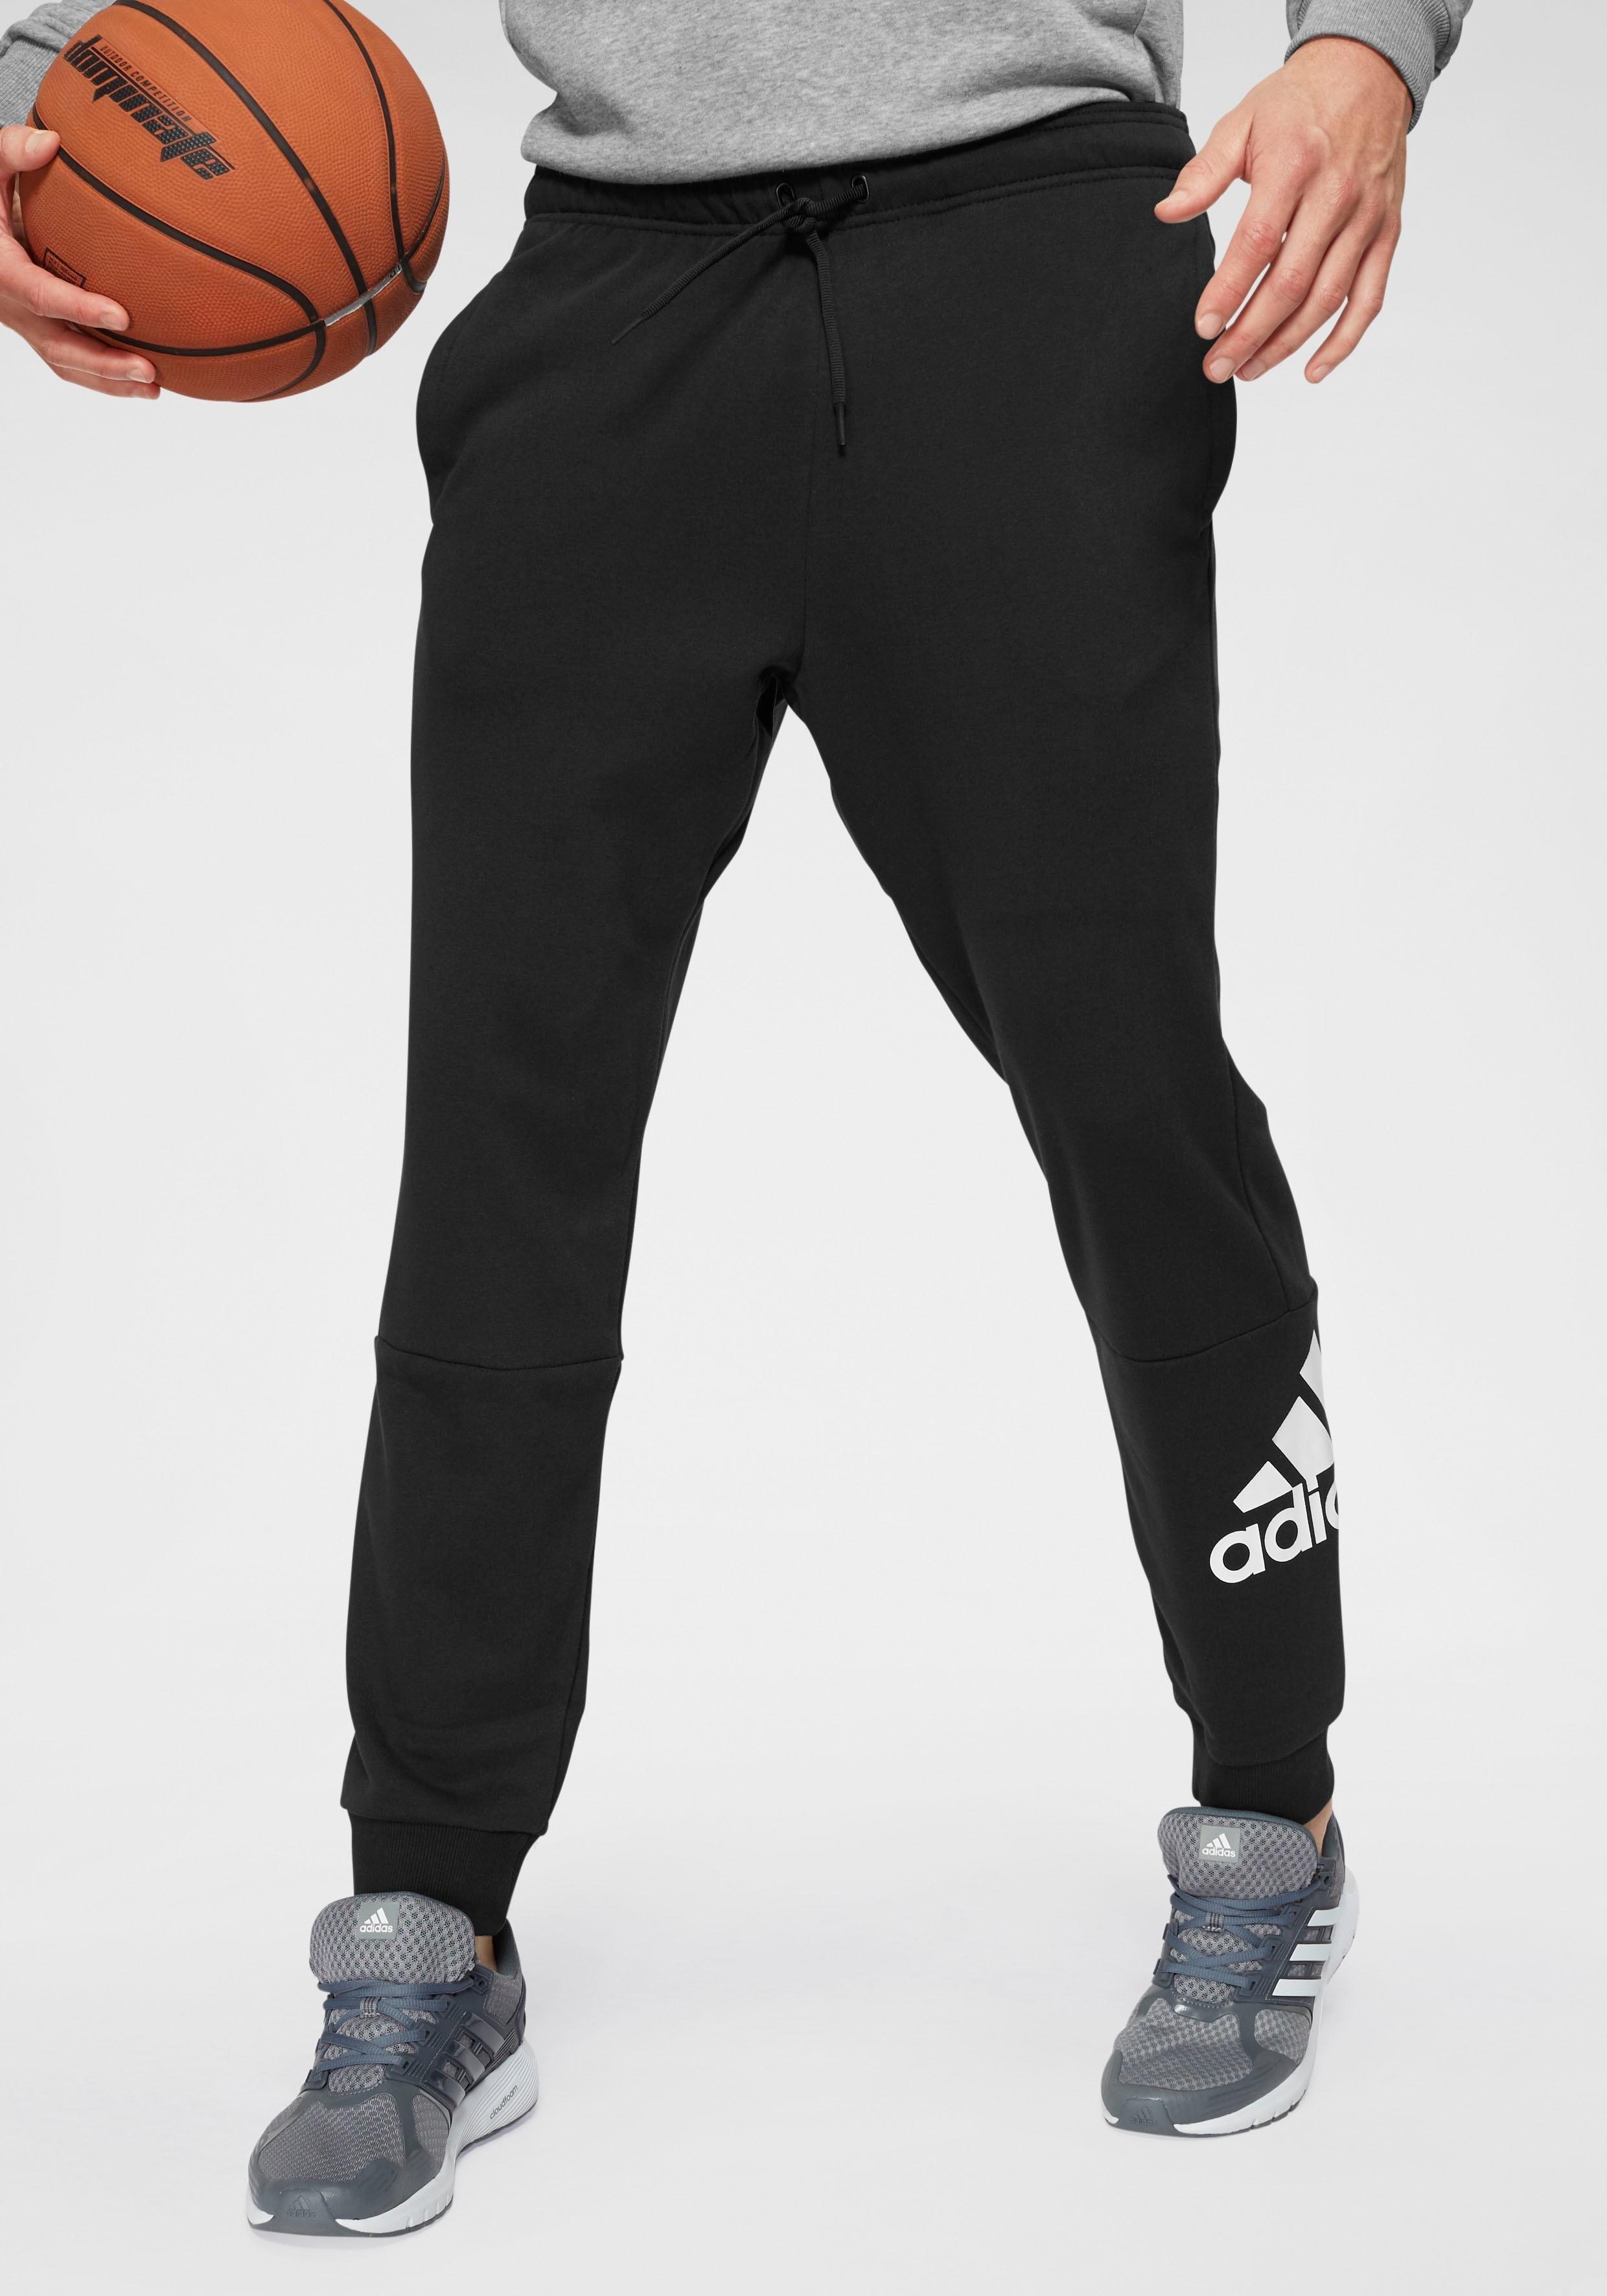 adidas Performance joggingbroek »MH BOS PANT FT« - verschillende betaalmethodes